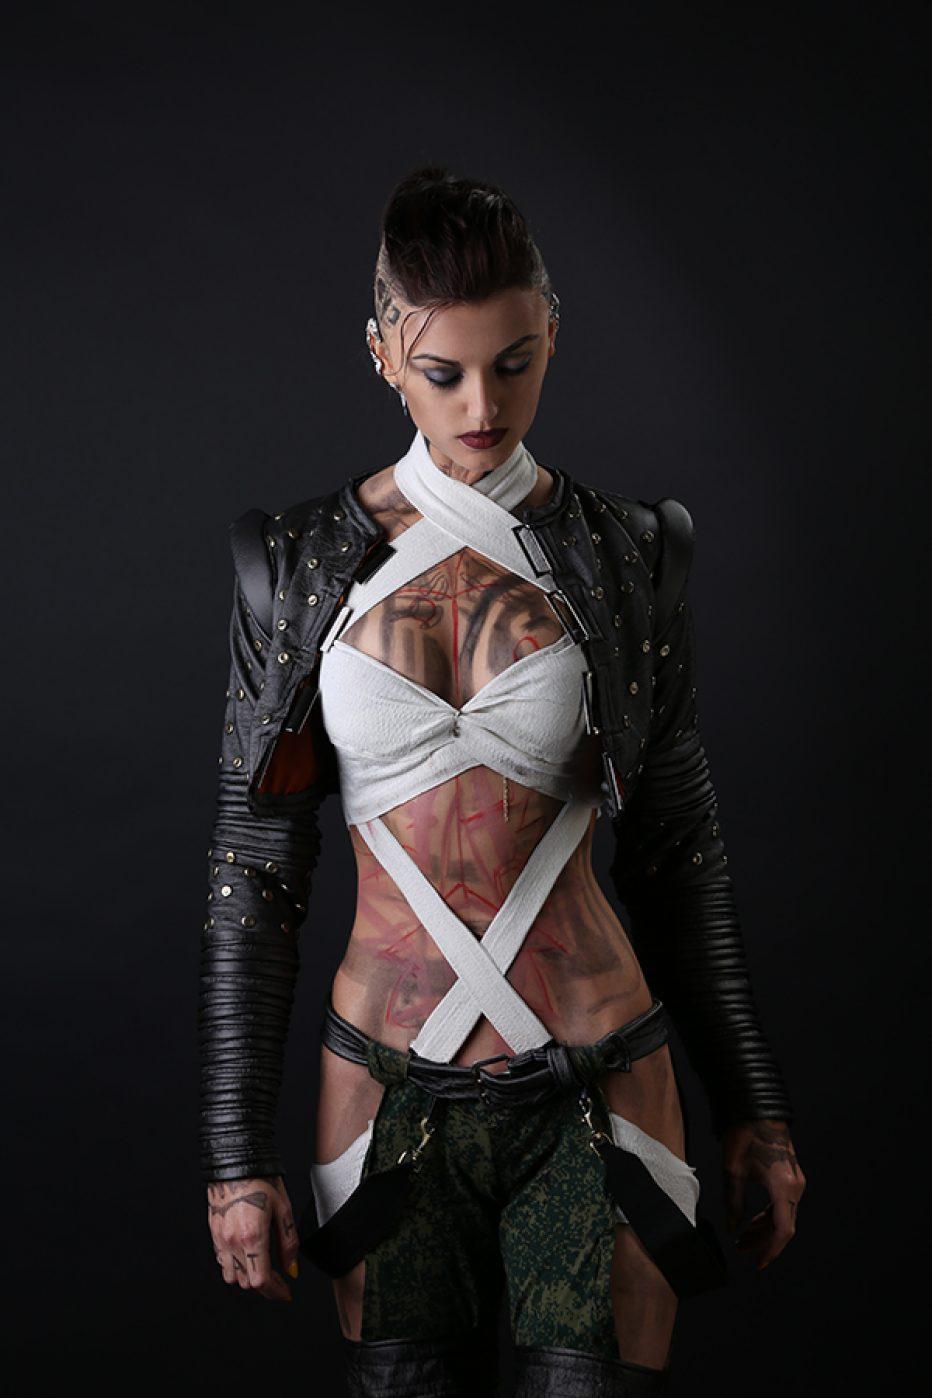 Mass-Effect-3-Jack-Cosplay-Gamers-Hereos-2.jpg